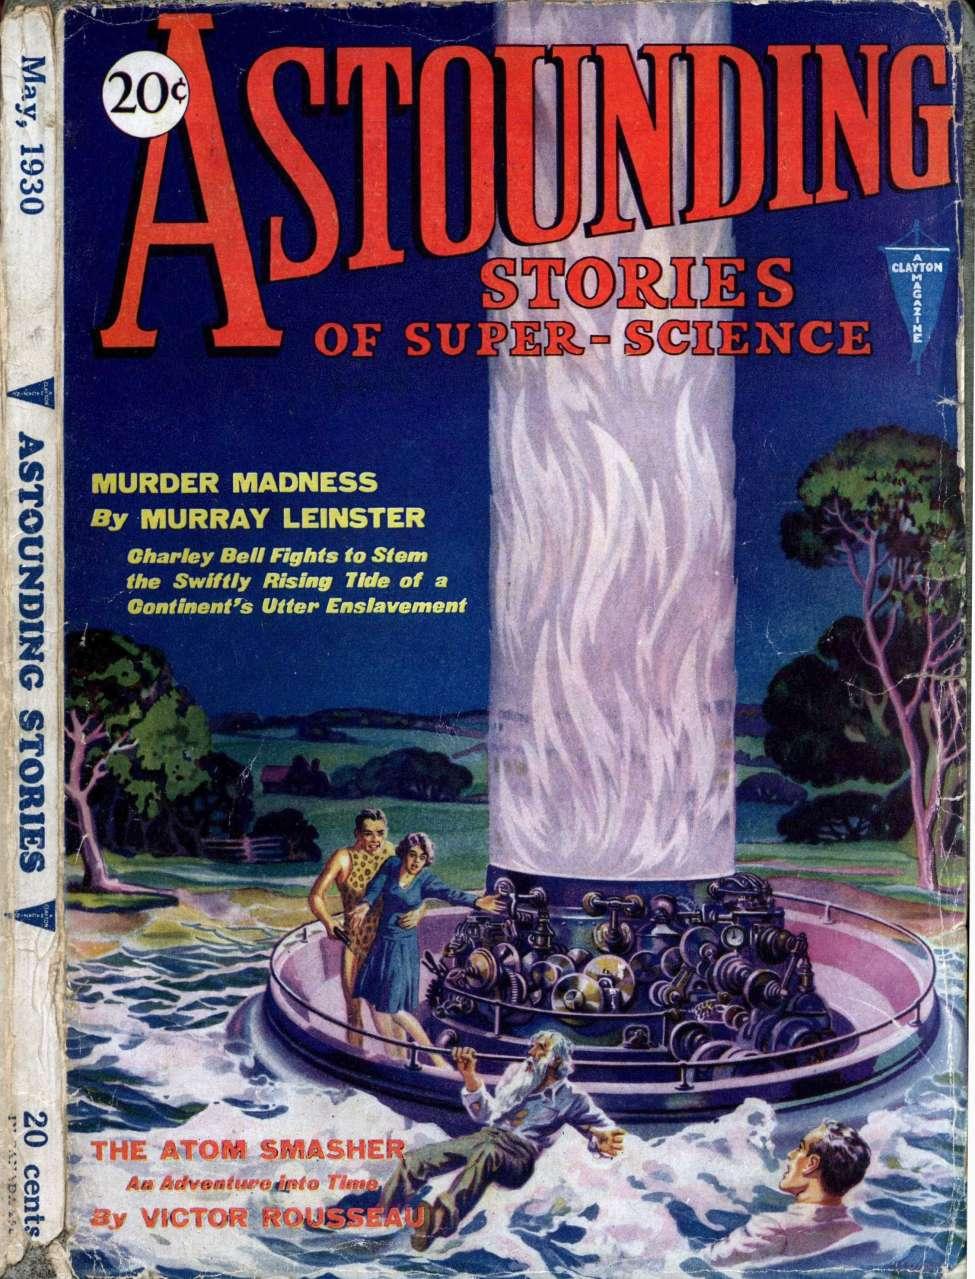 Comic Book Cover For Astounding v02 02 - Murder Madness - Murray Leinster